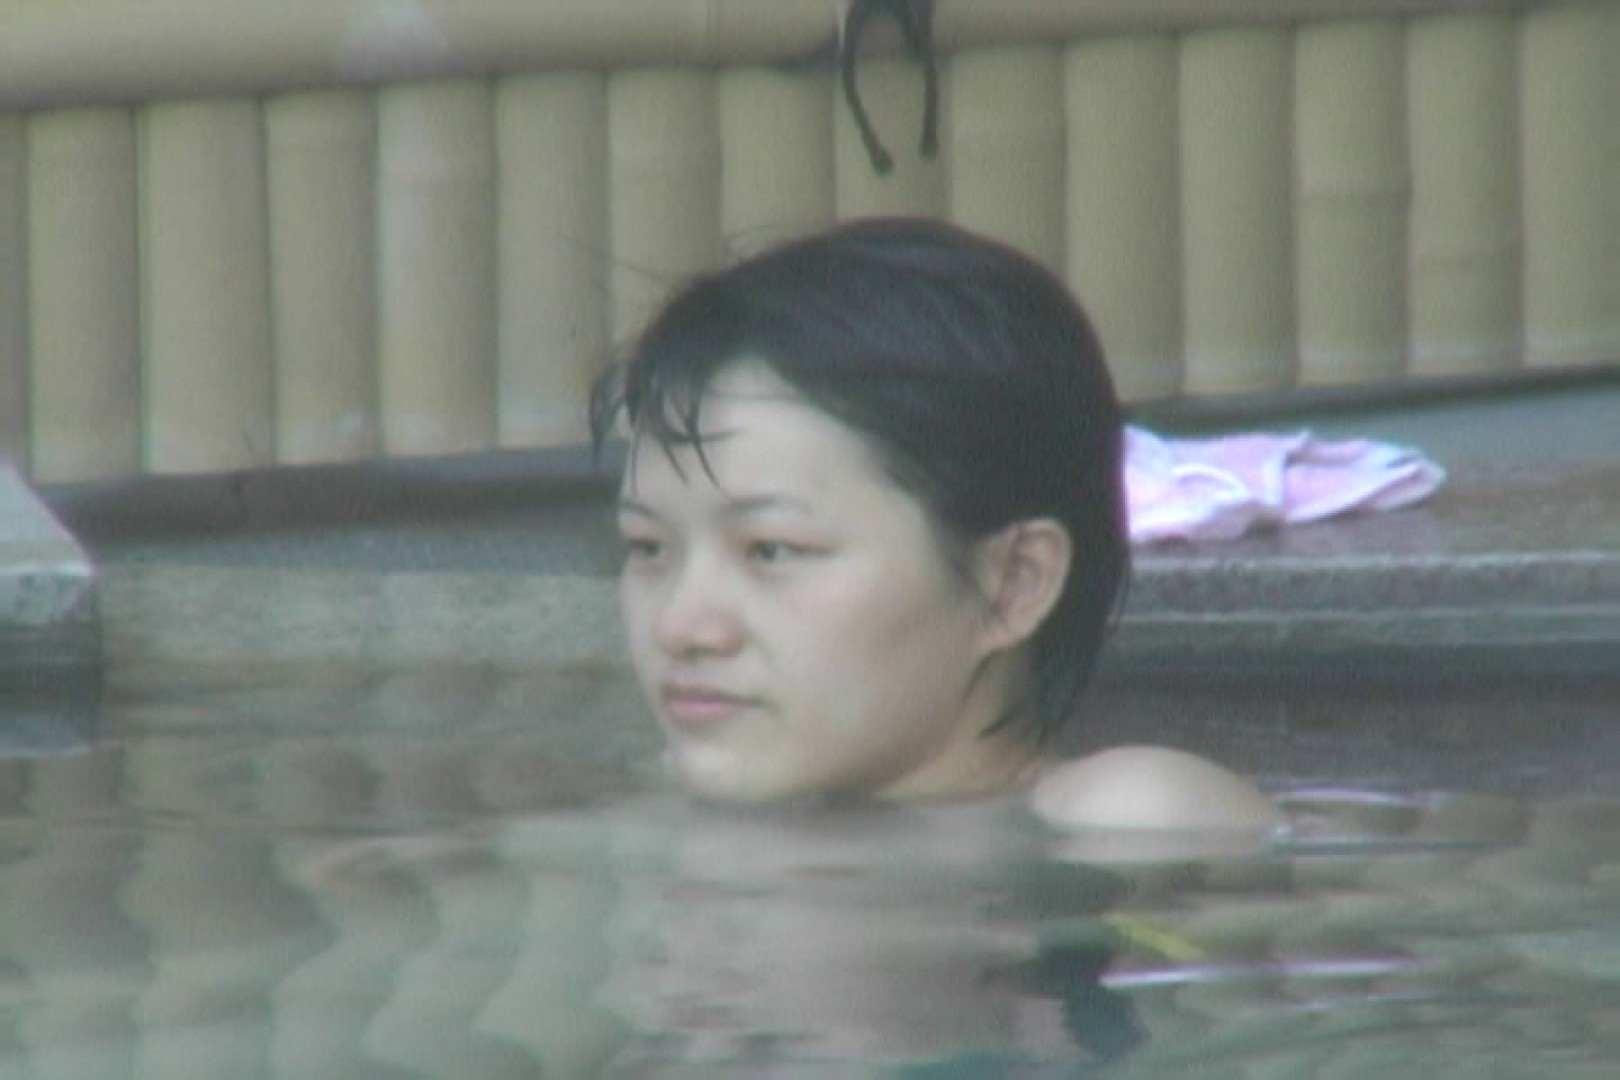 Aquaな露天風呂Vol.116 露天風呂編  107PIX 78